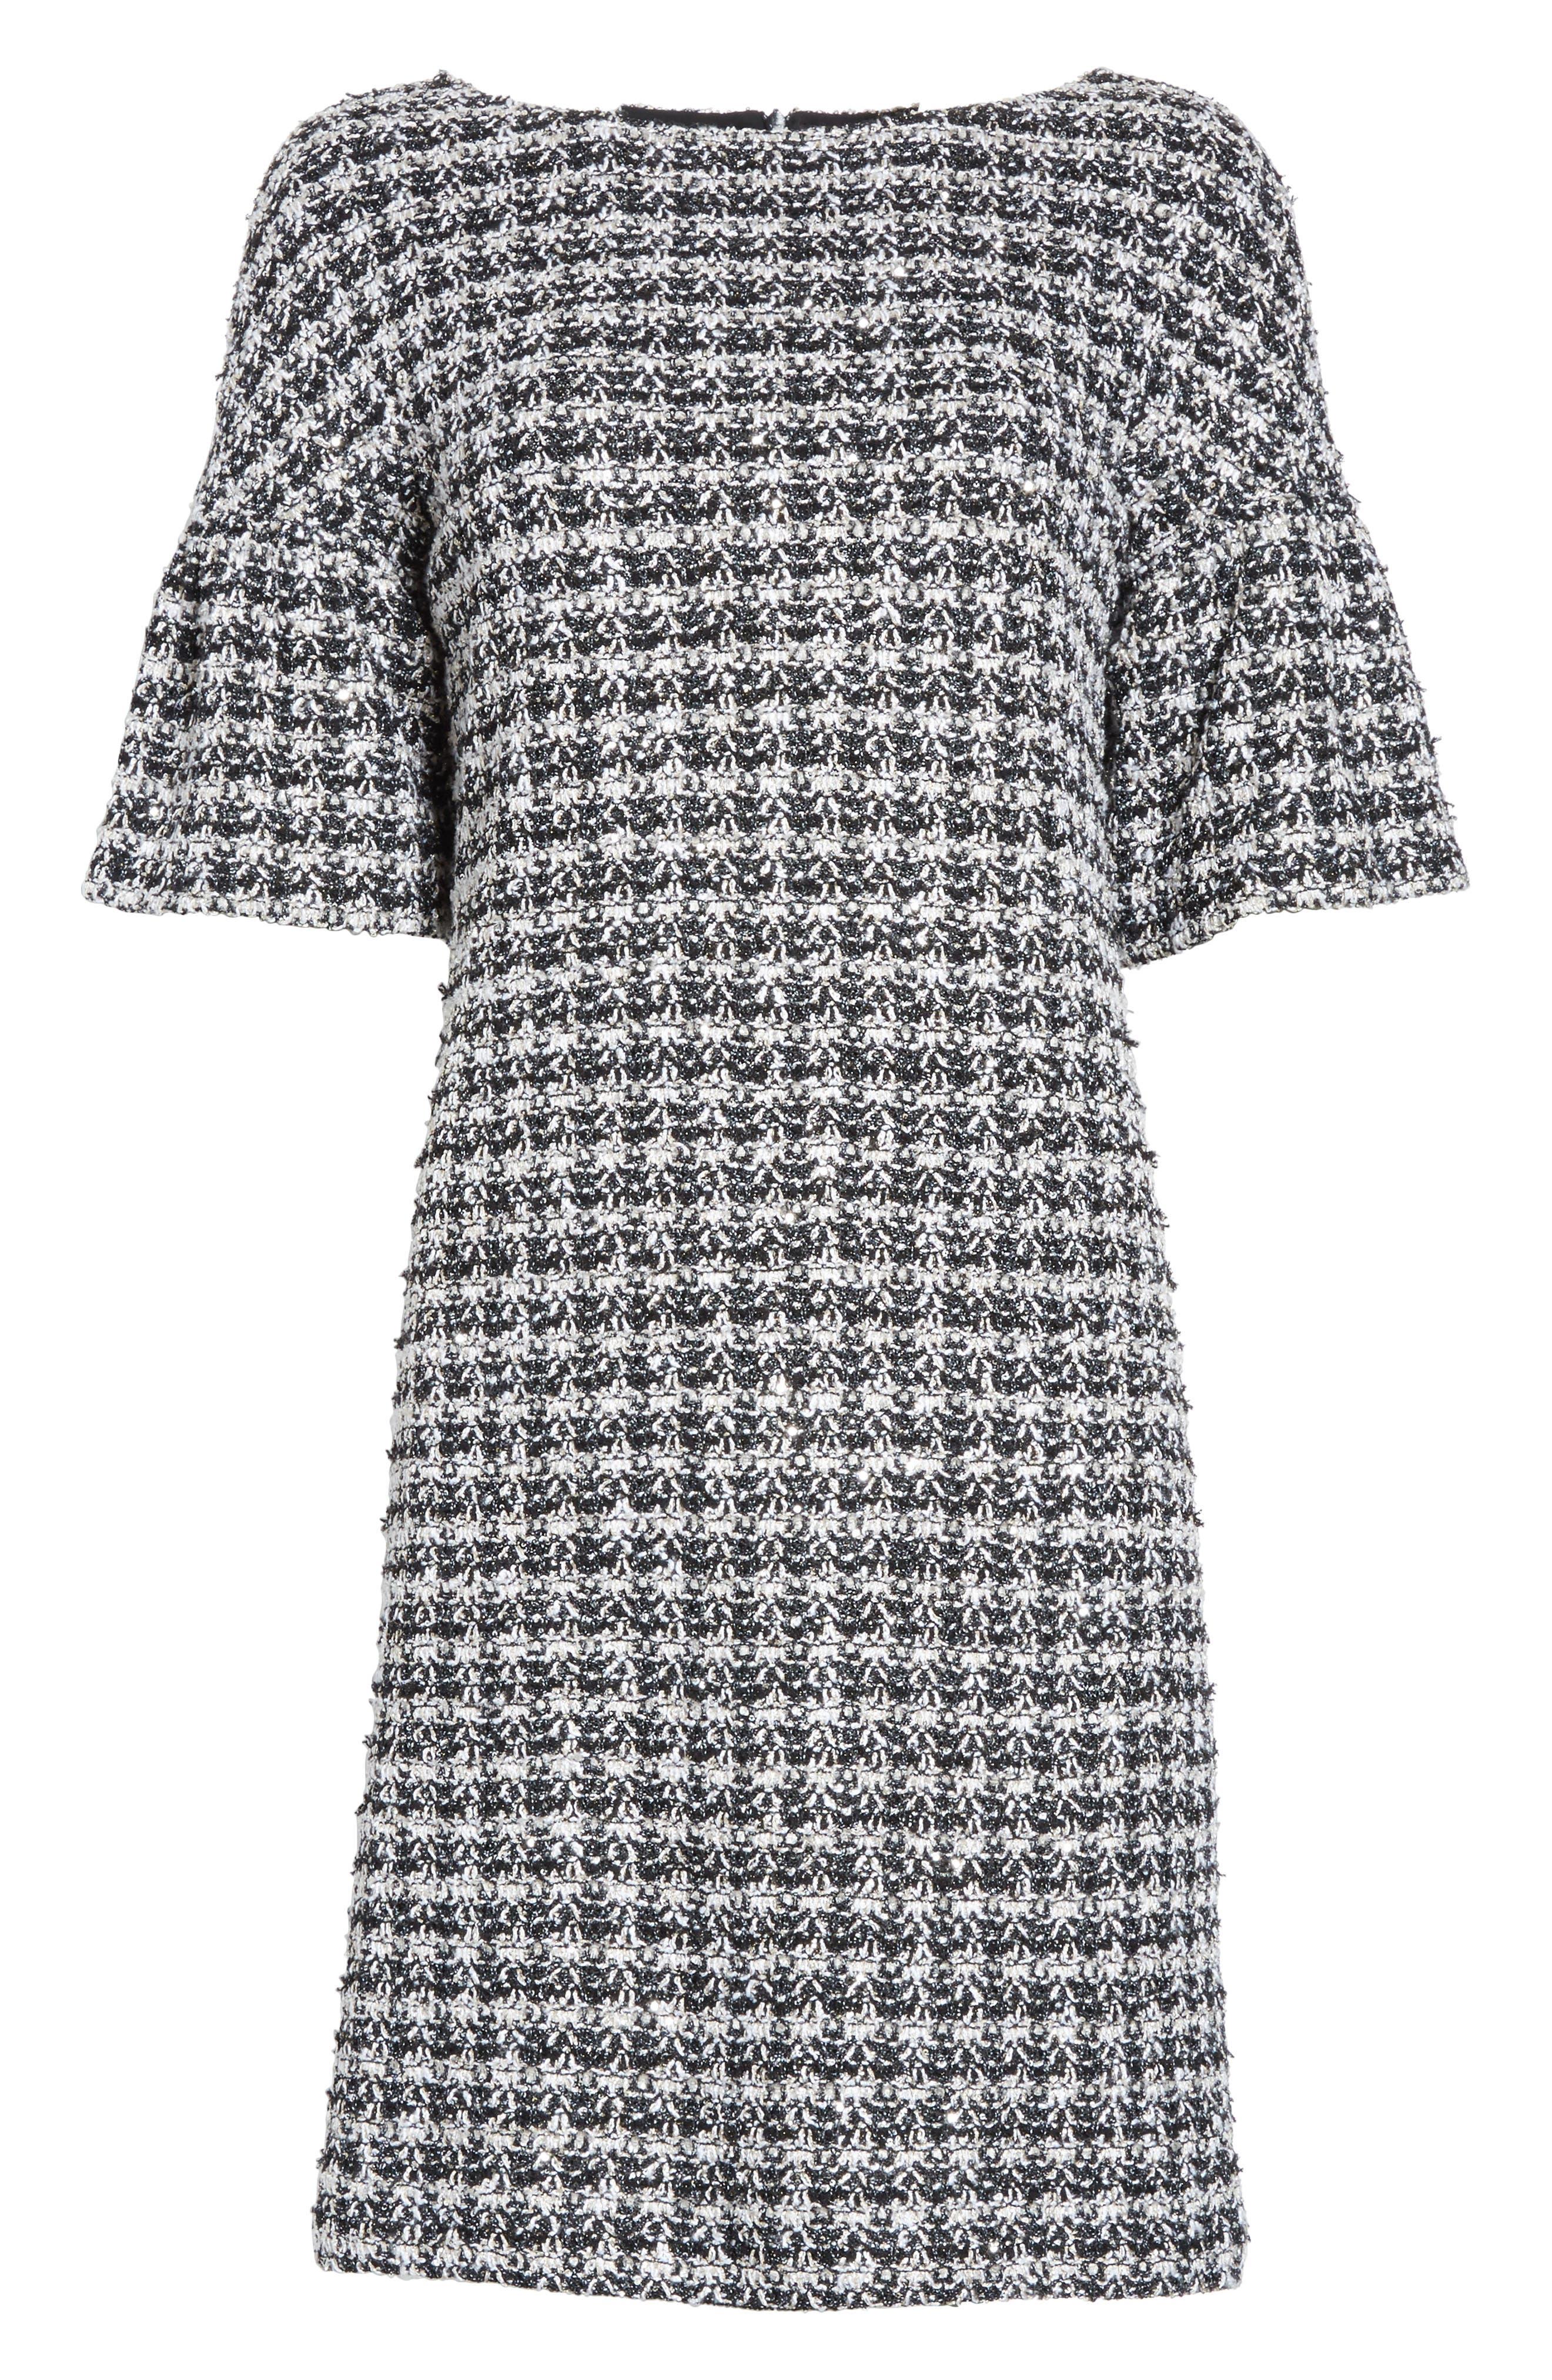 Metallic Tweed Bell Sleeve Dress,                             Alternate thumbnail 7, color,                             Caviar Multi